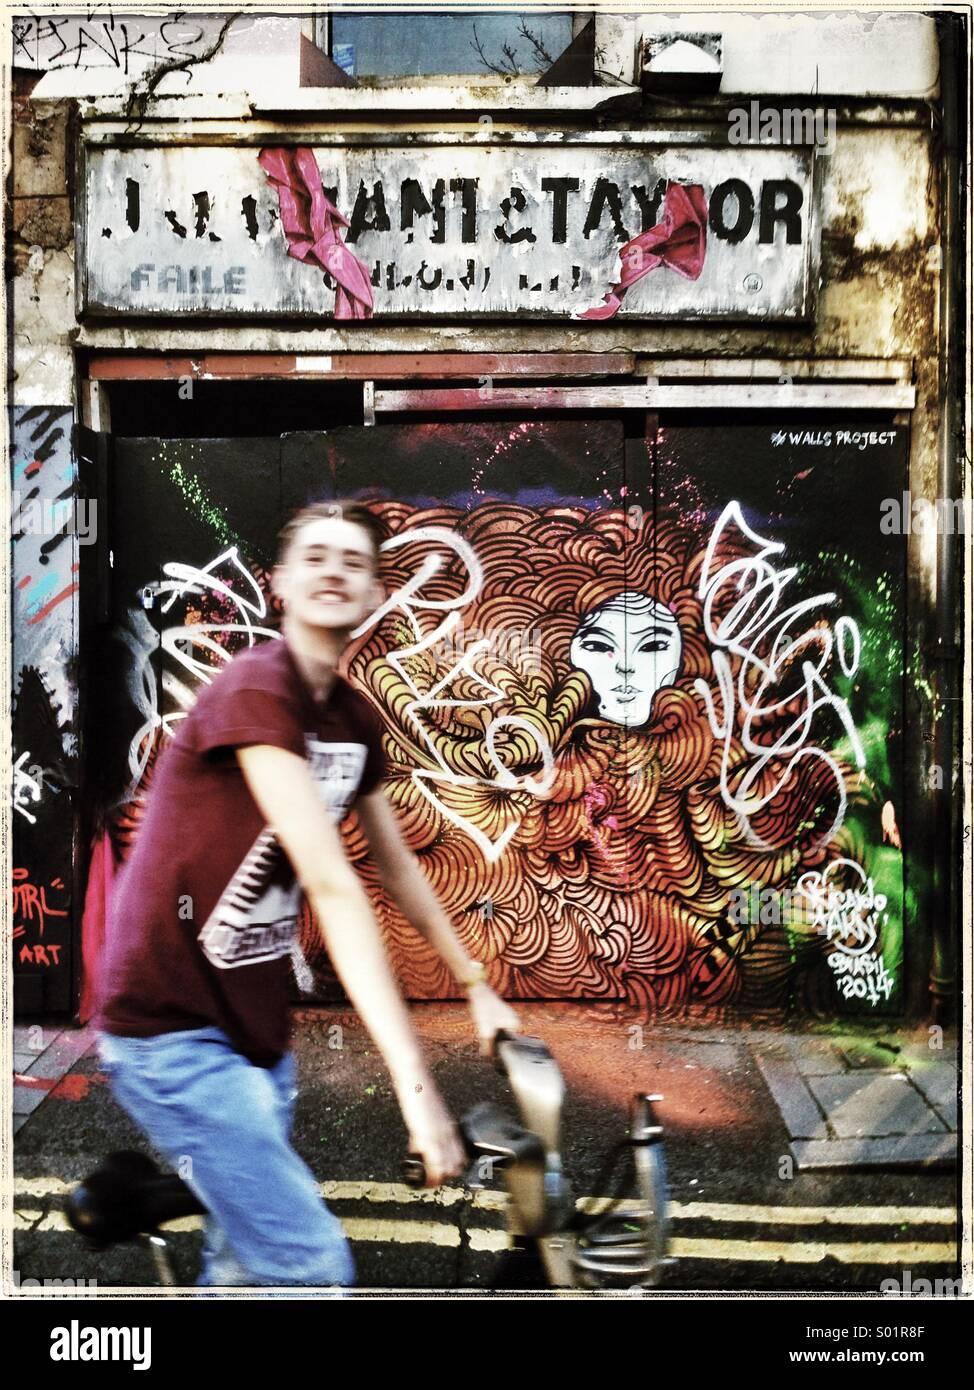 Pared de graffiti Imagen De Stock